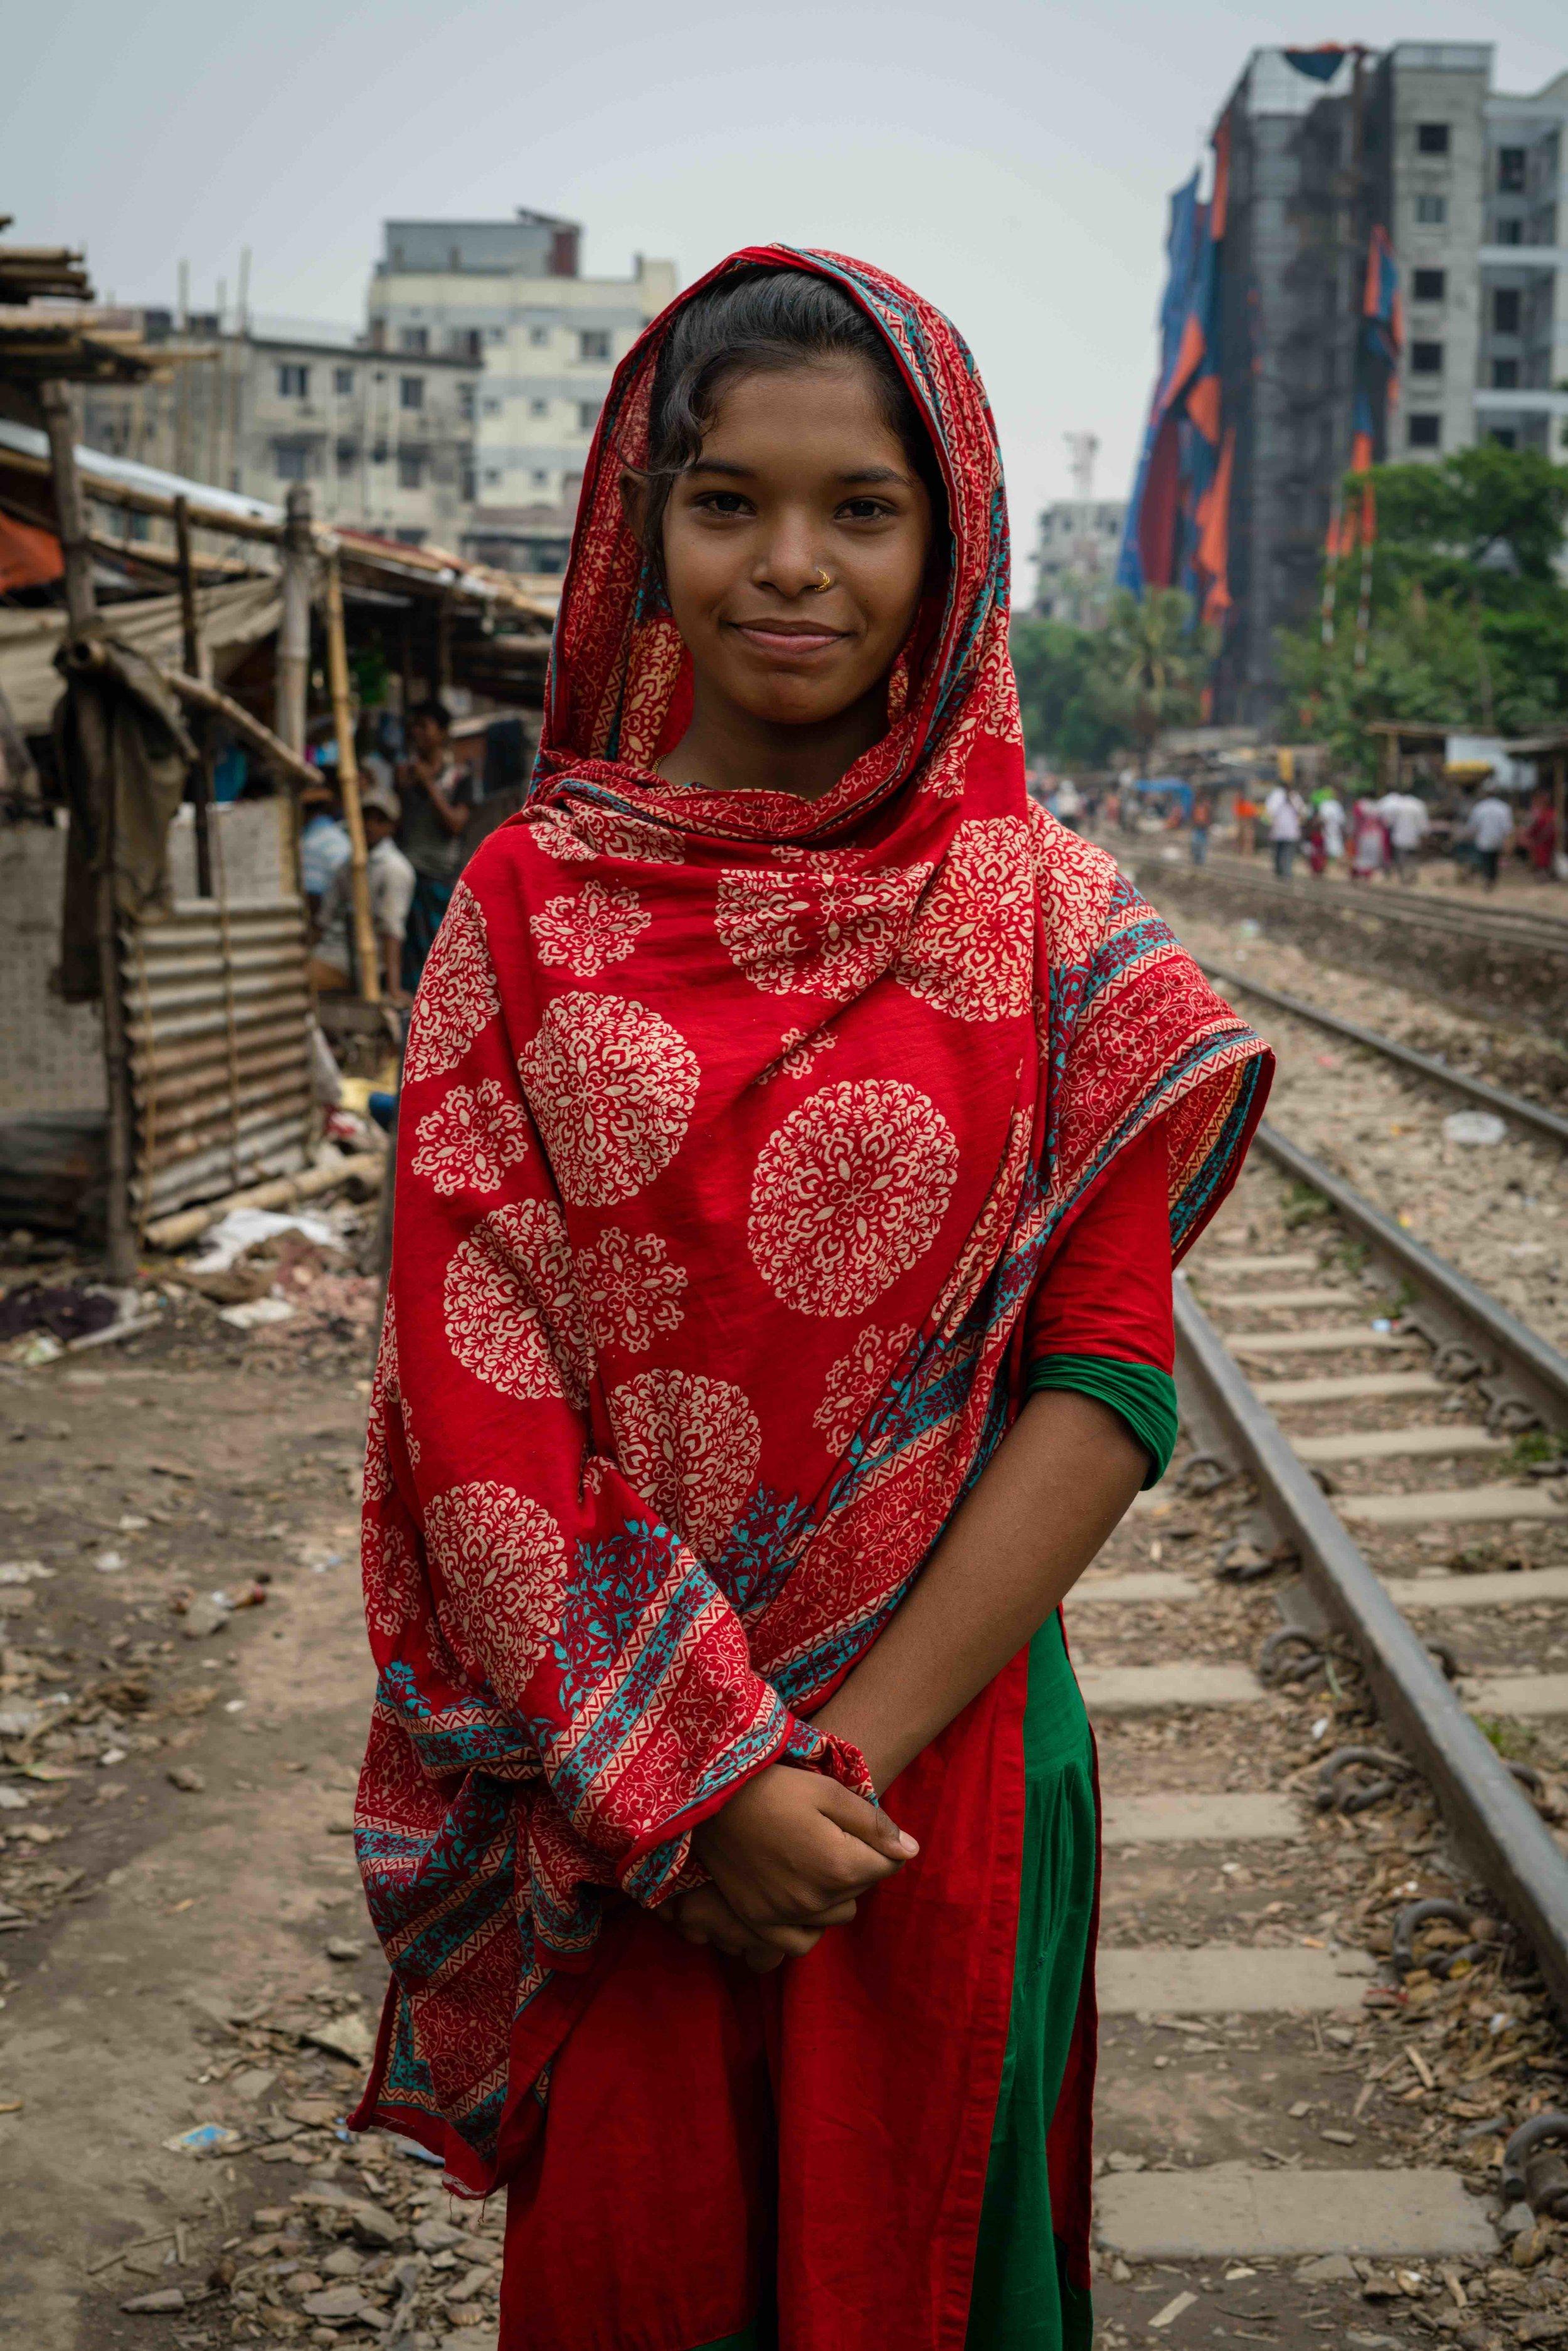 F2H_LaurenKanaChan_Bangladesh_Slum Education-10 copy.jpg